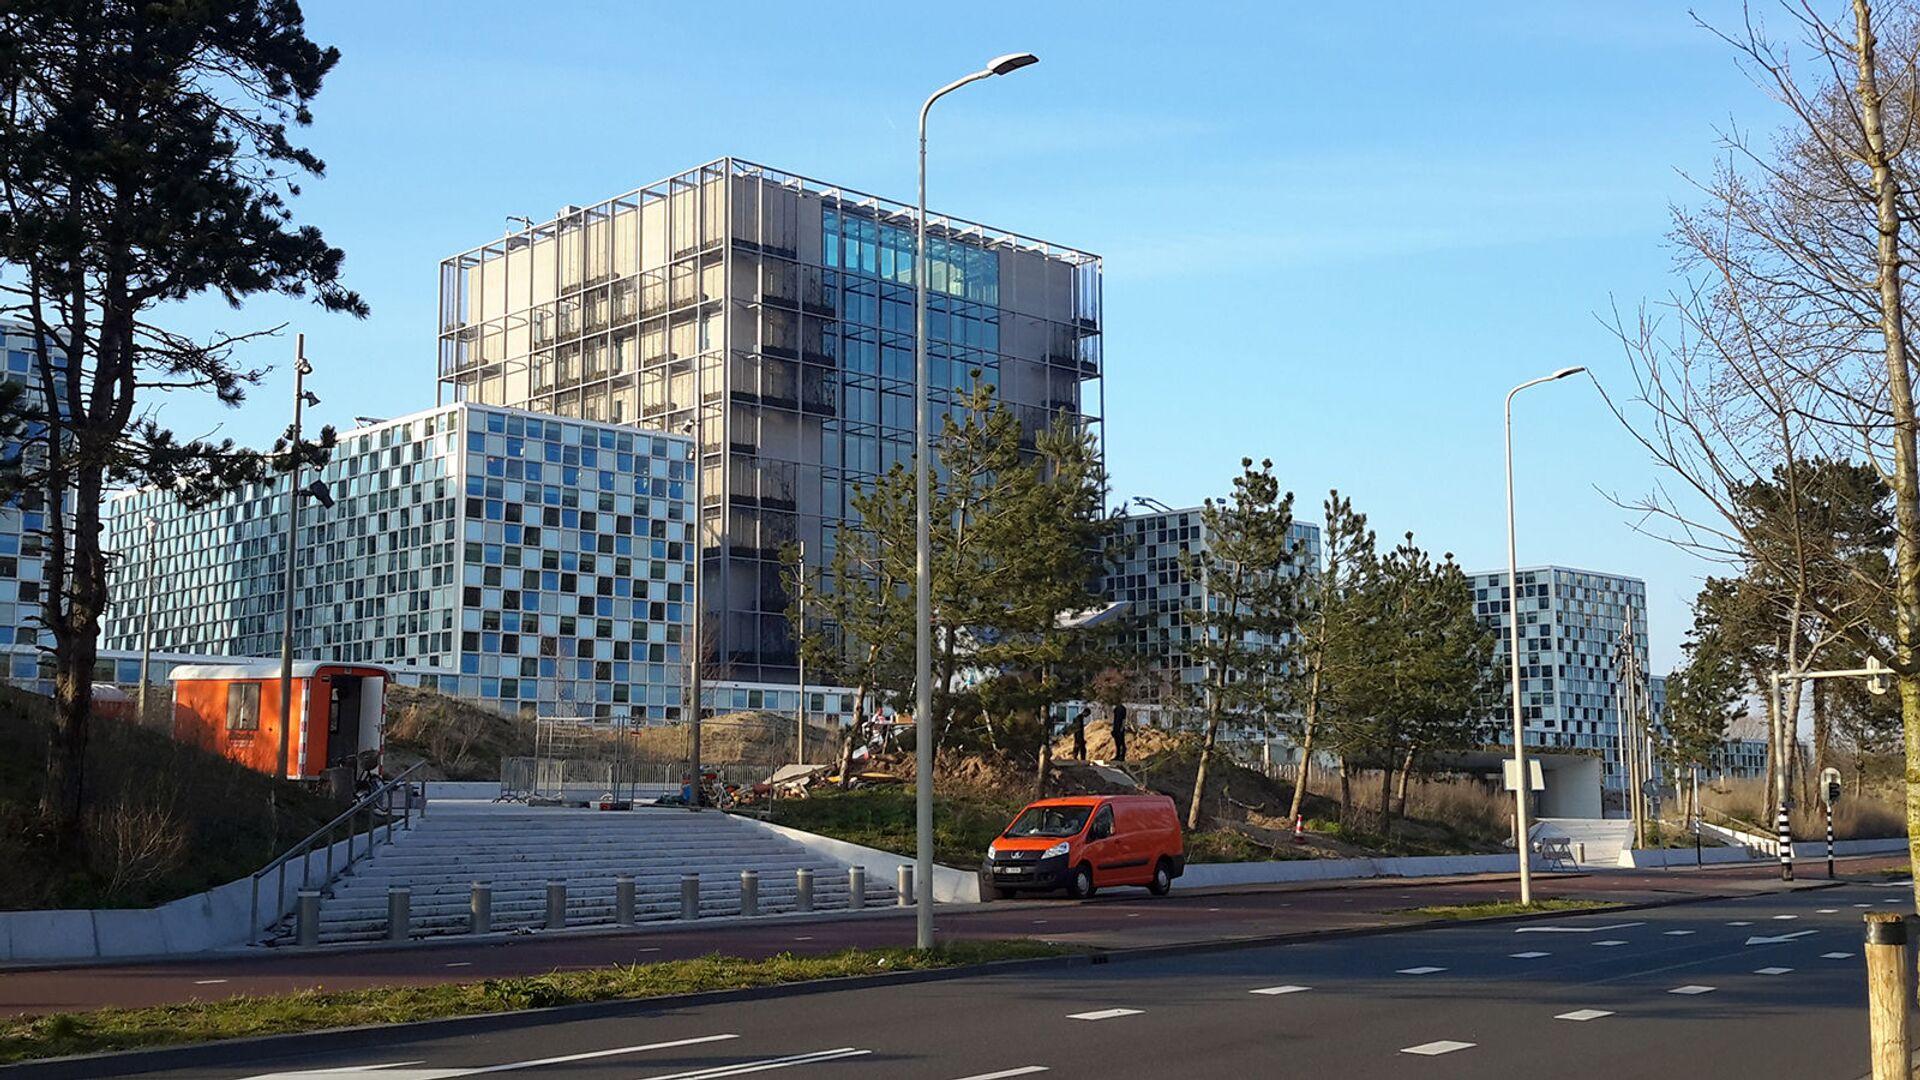 Здание Международного уголовного суда, Гаага - Sputnik Արմենիա, 1920, 14.10.2021